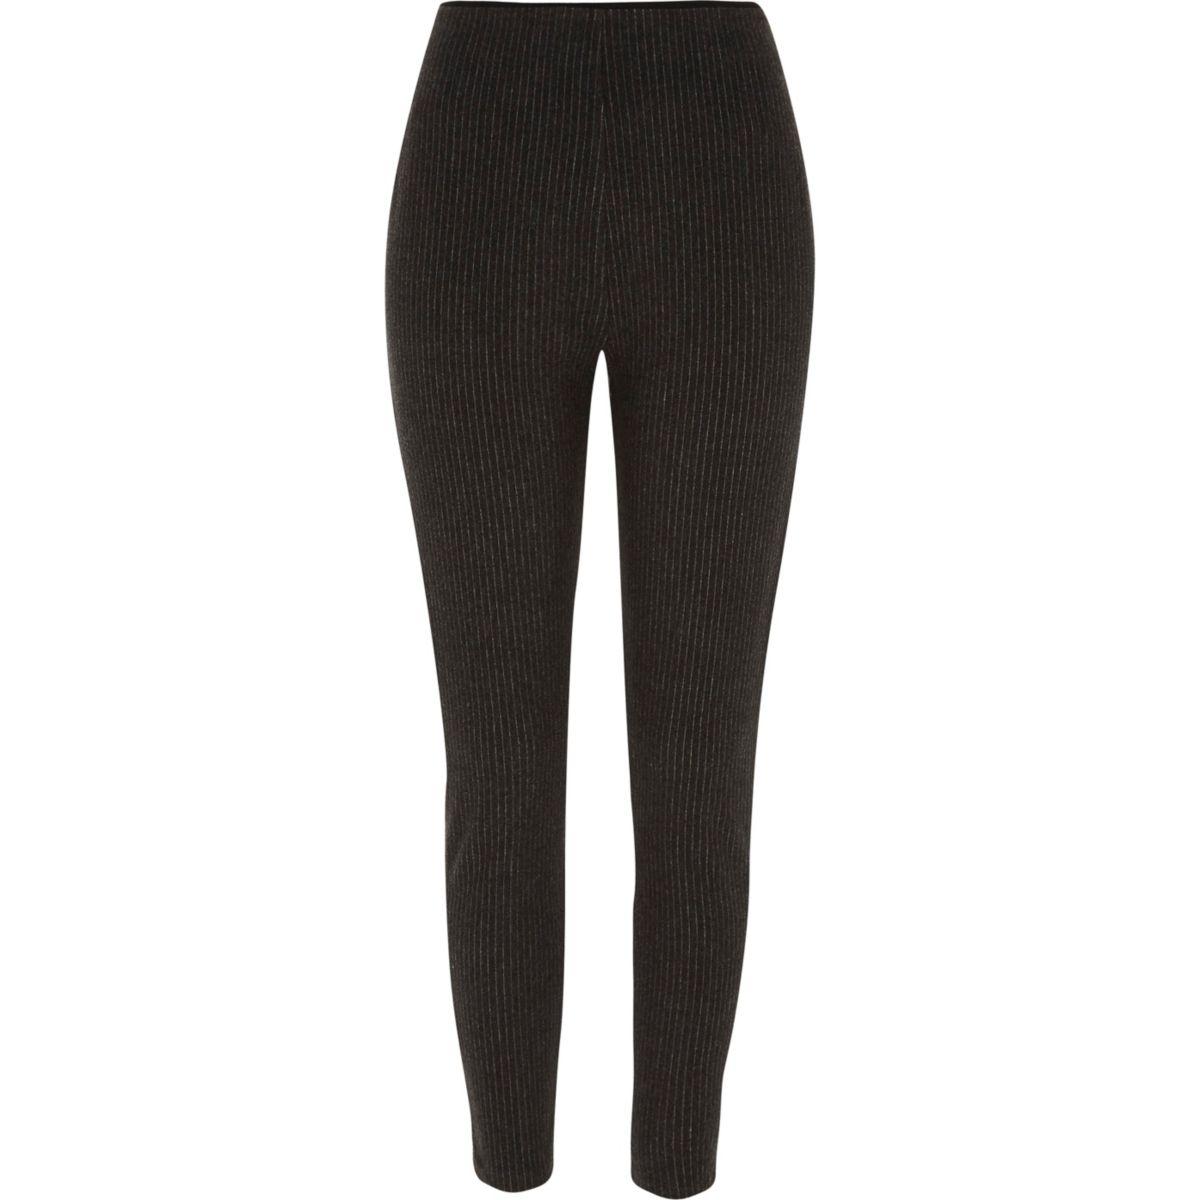 Grey stripe leggings